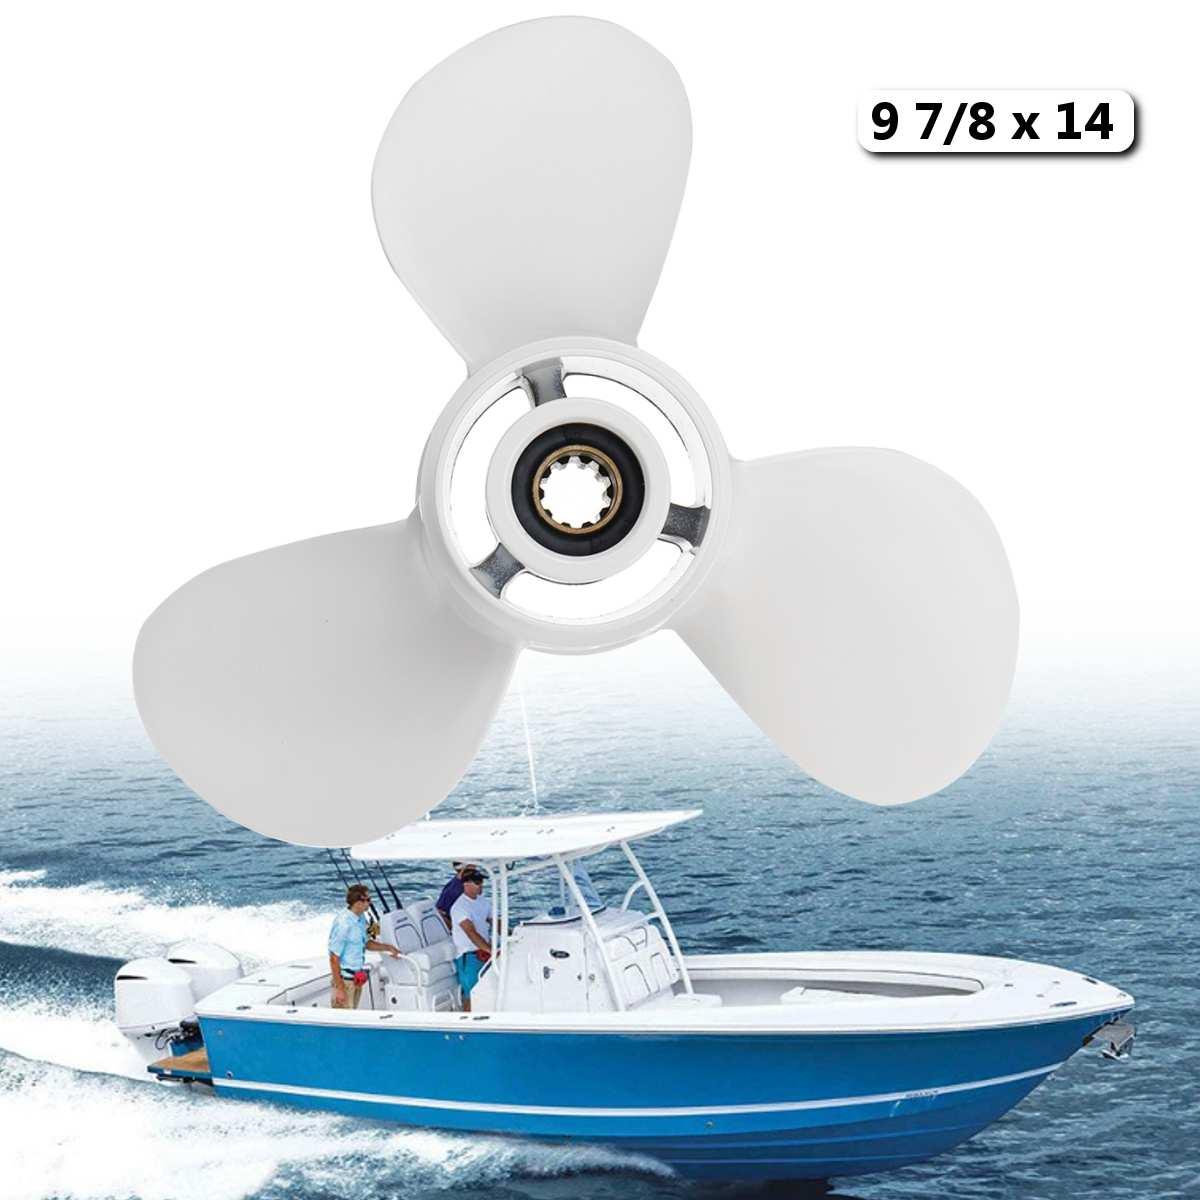 664-45952-00-EL For Yamaha 20-30HP 9 7/8 x 14 Boat Outboard Propeller Aluminum 10 Spline Tooths White 3 Blades R Rotation664-45952-00-EL For Yamaha 20-30HP 9 7/8 x 14 Boat Outboard Propeller Aluminum 10 Spline Tooths White 3 Blades R Rotation